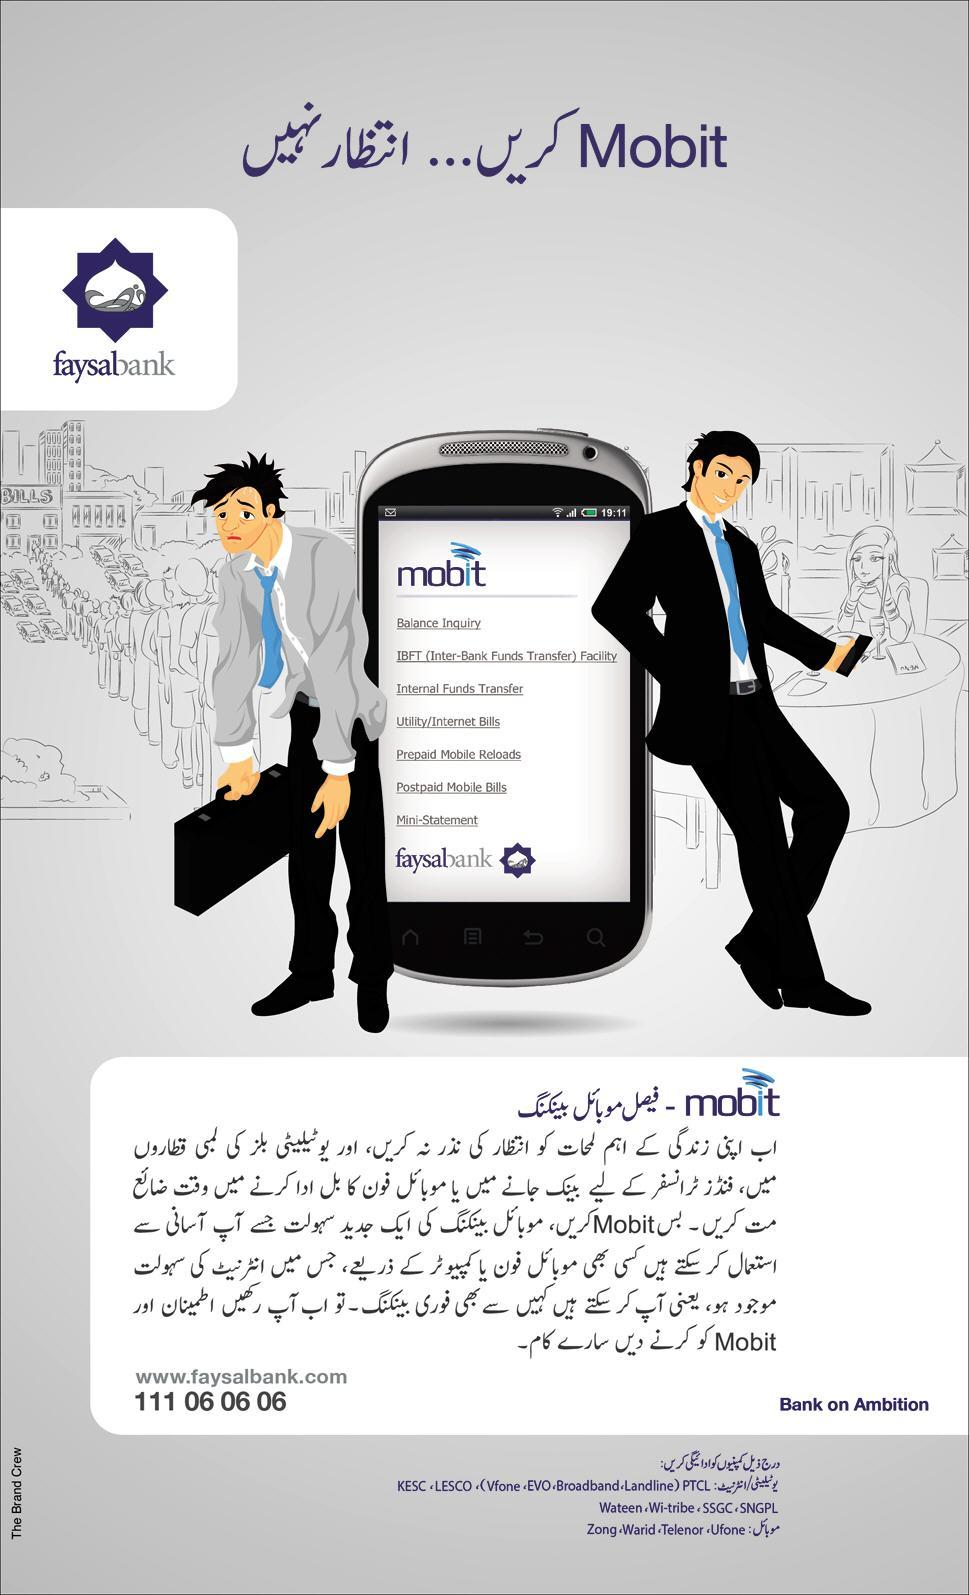 Ebanking Mobit Faysal Bank